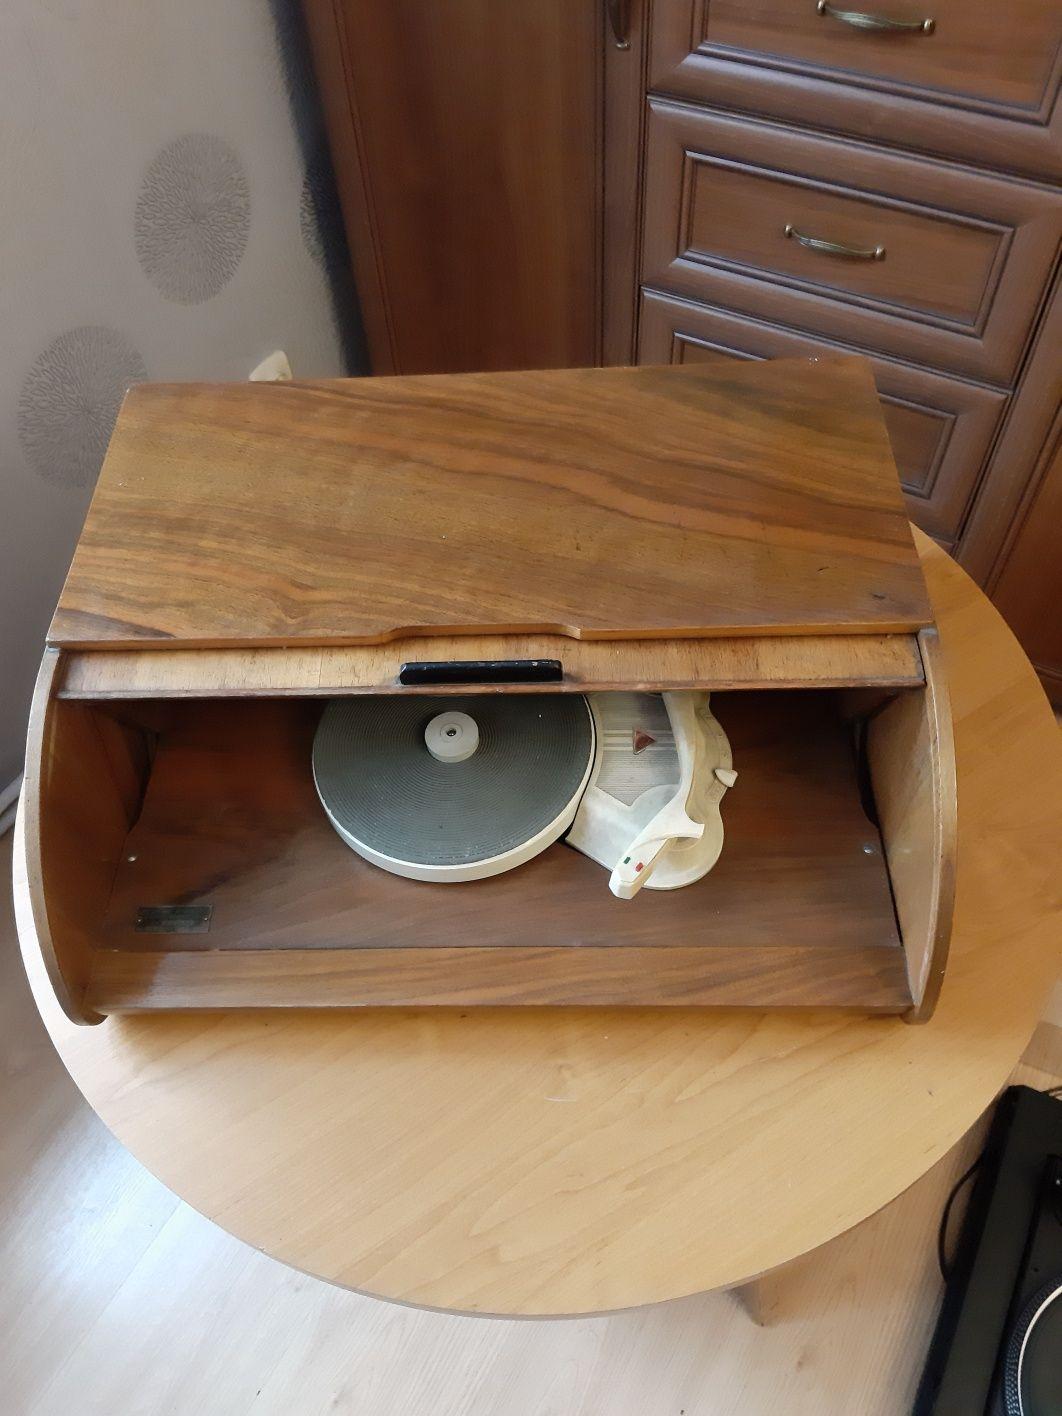 Stary gramofon w skrzynce